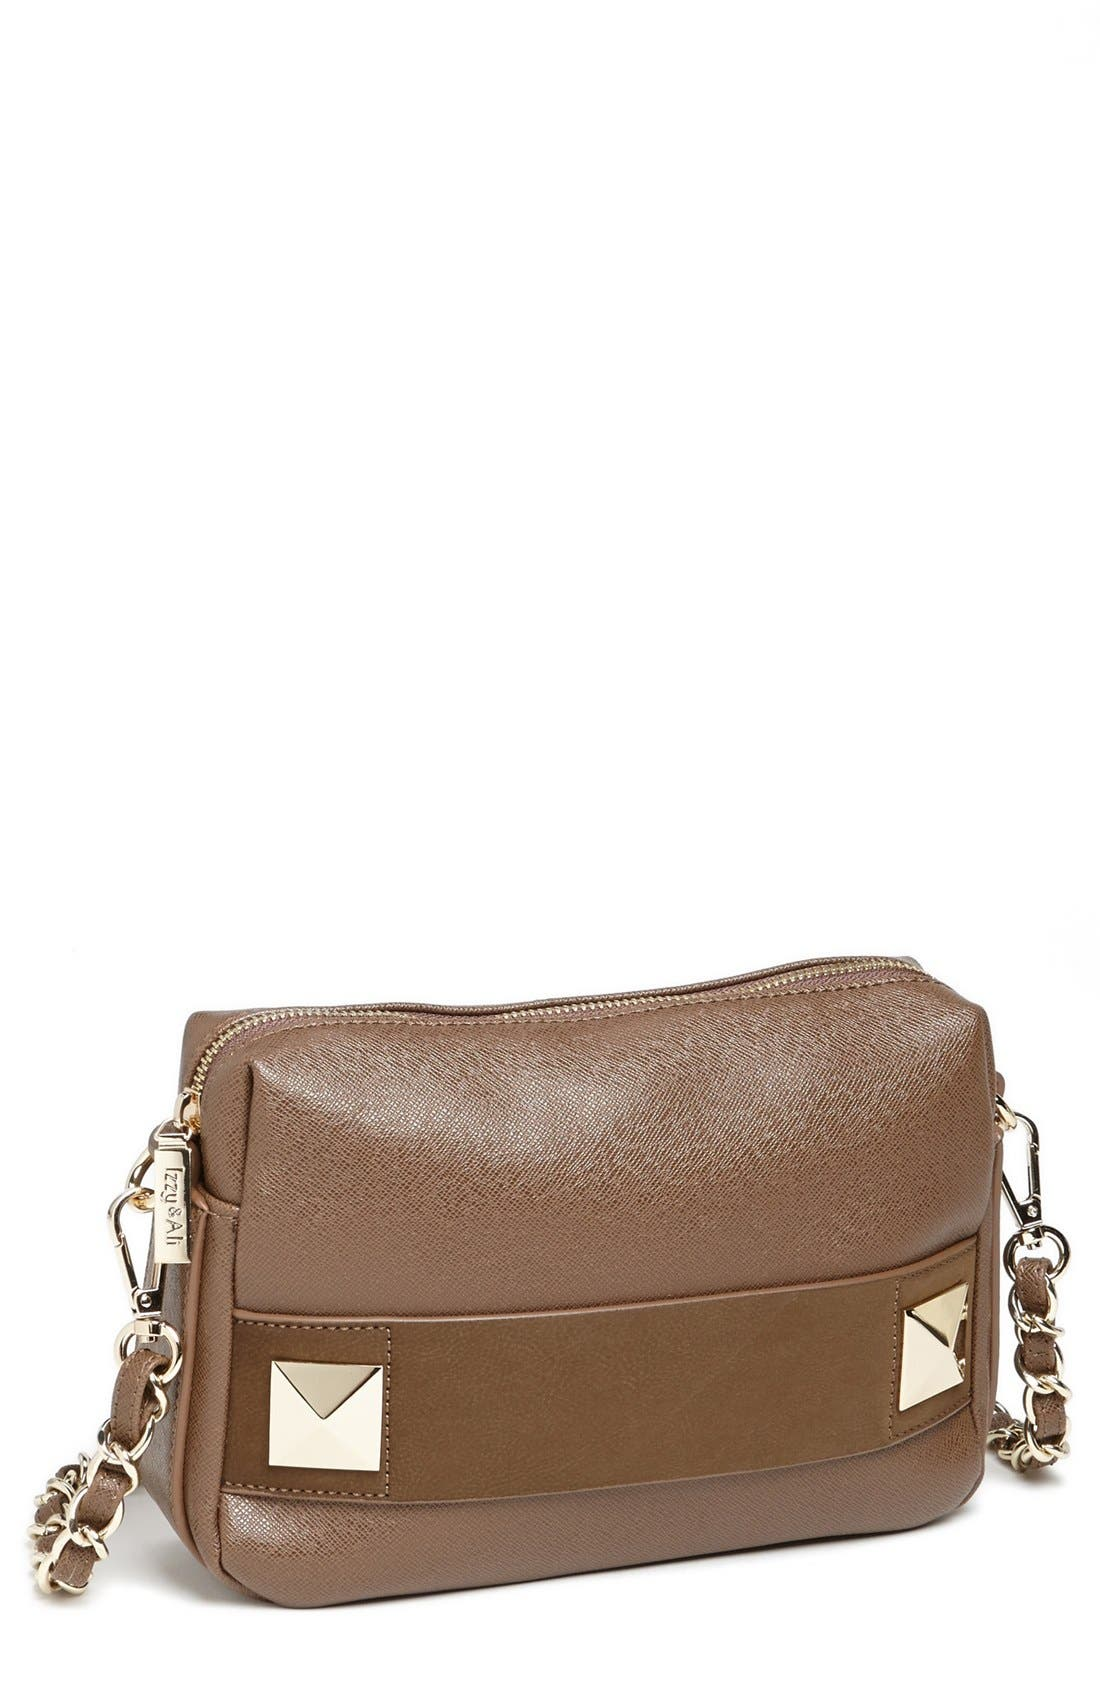 Alternate Image 1 Selected - Izzy & Ali 'Ella' Faux Leather Crossbody Bag